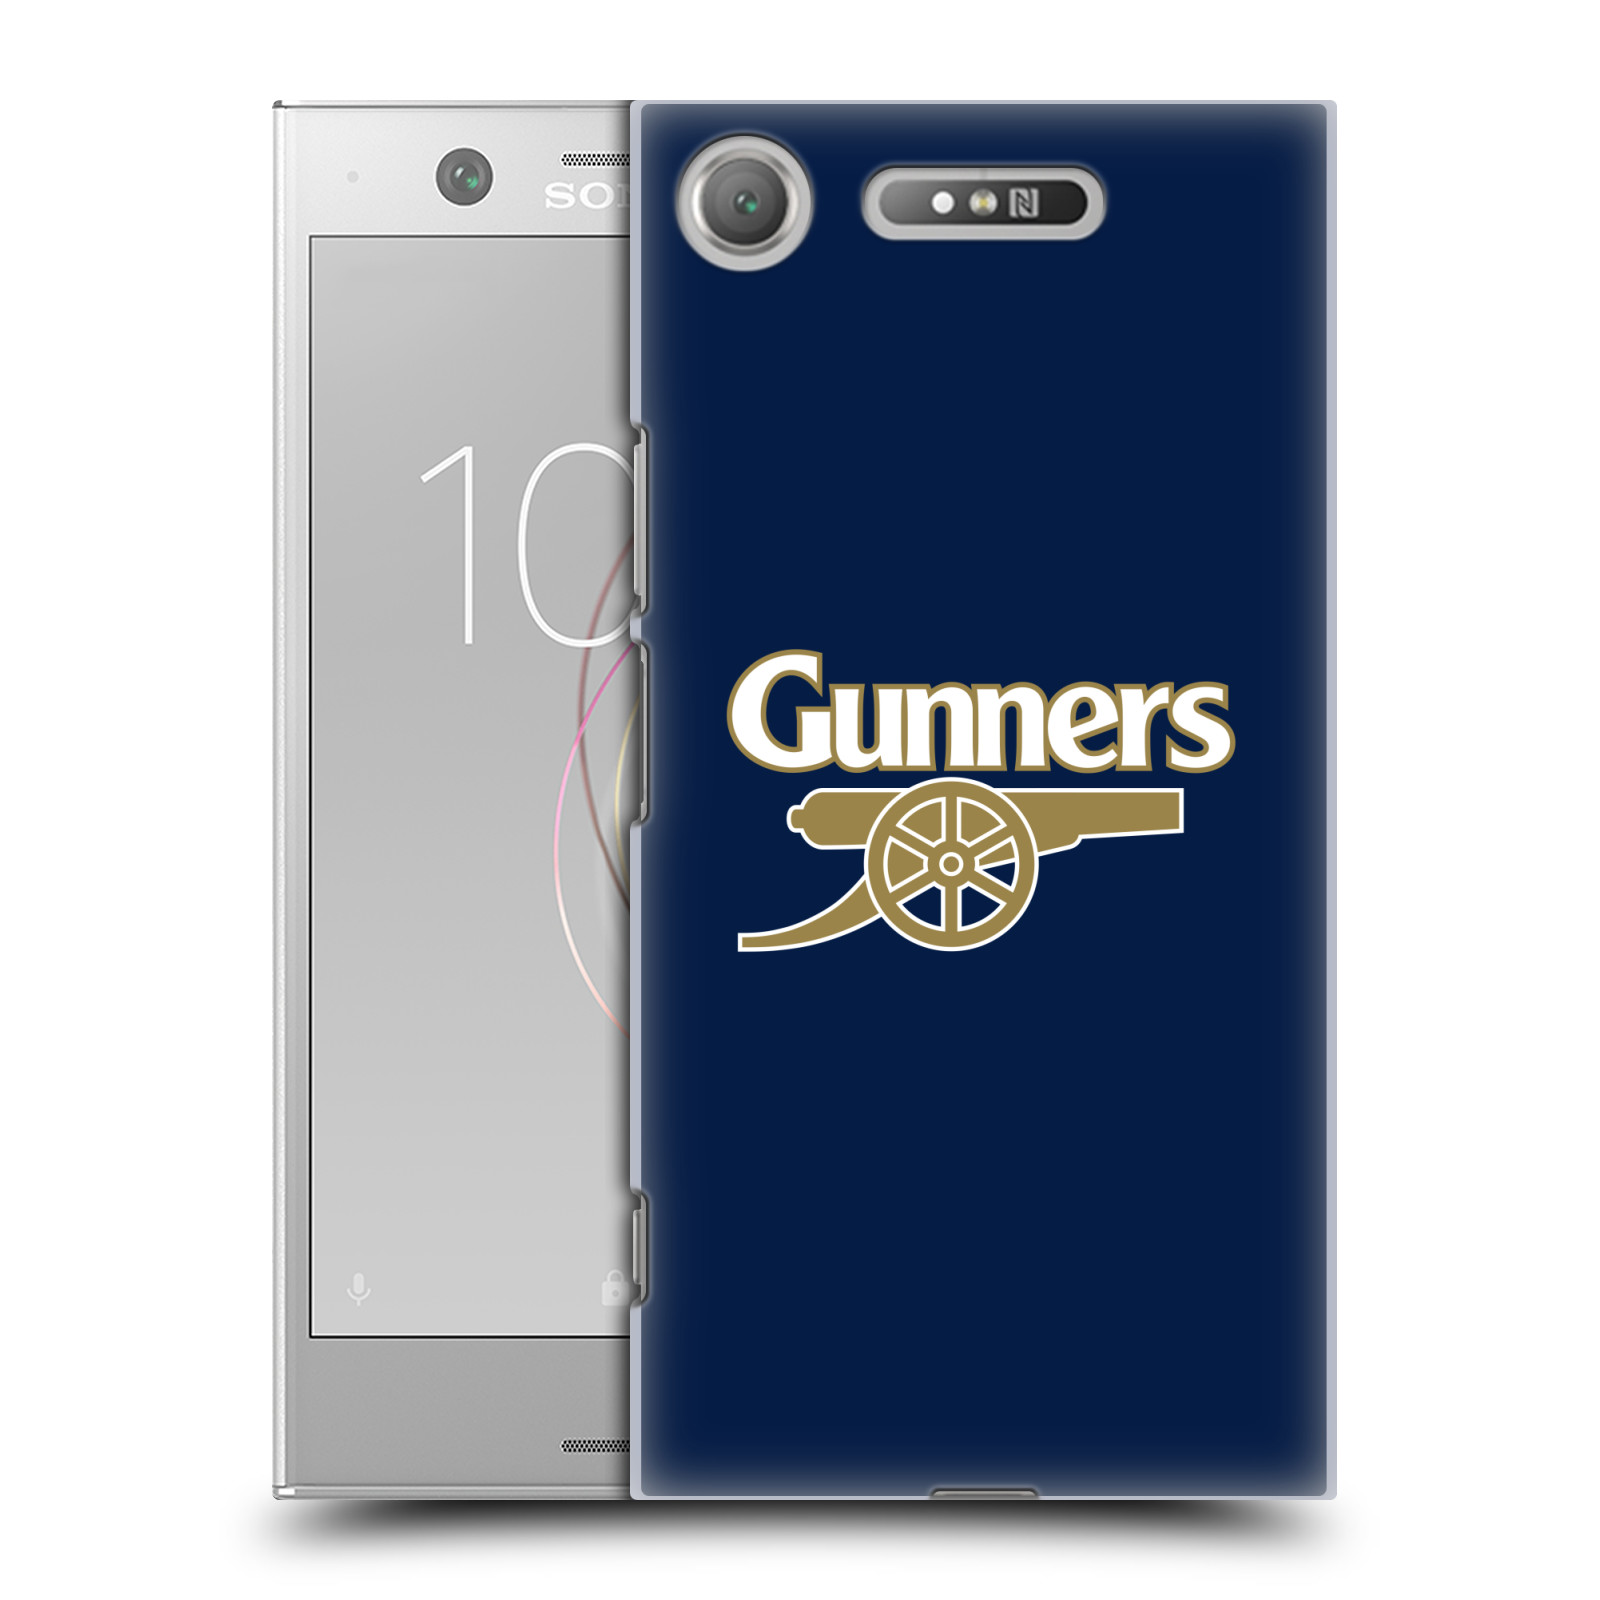 Plastové pouzdro na mobil Sony Xperia XZ1 - Head Case - Arsenal FC - Gunners